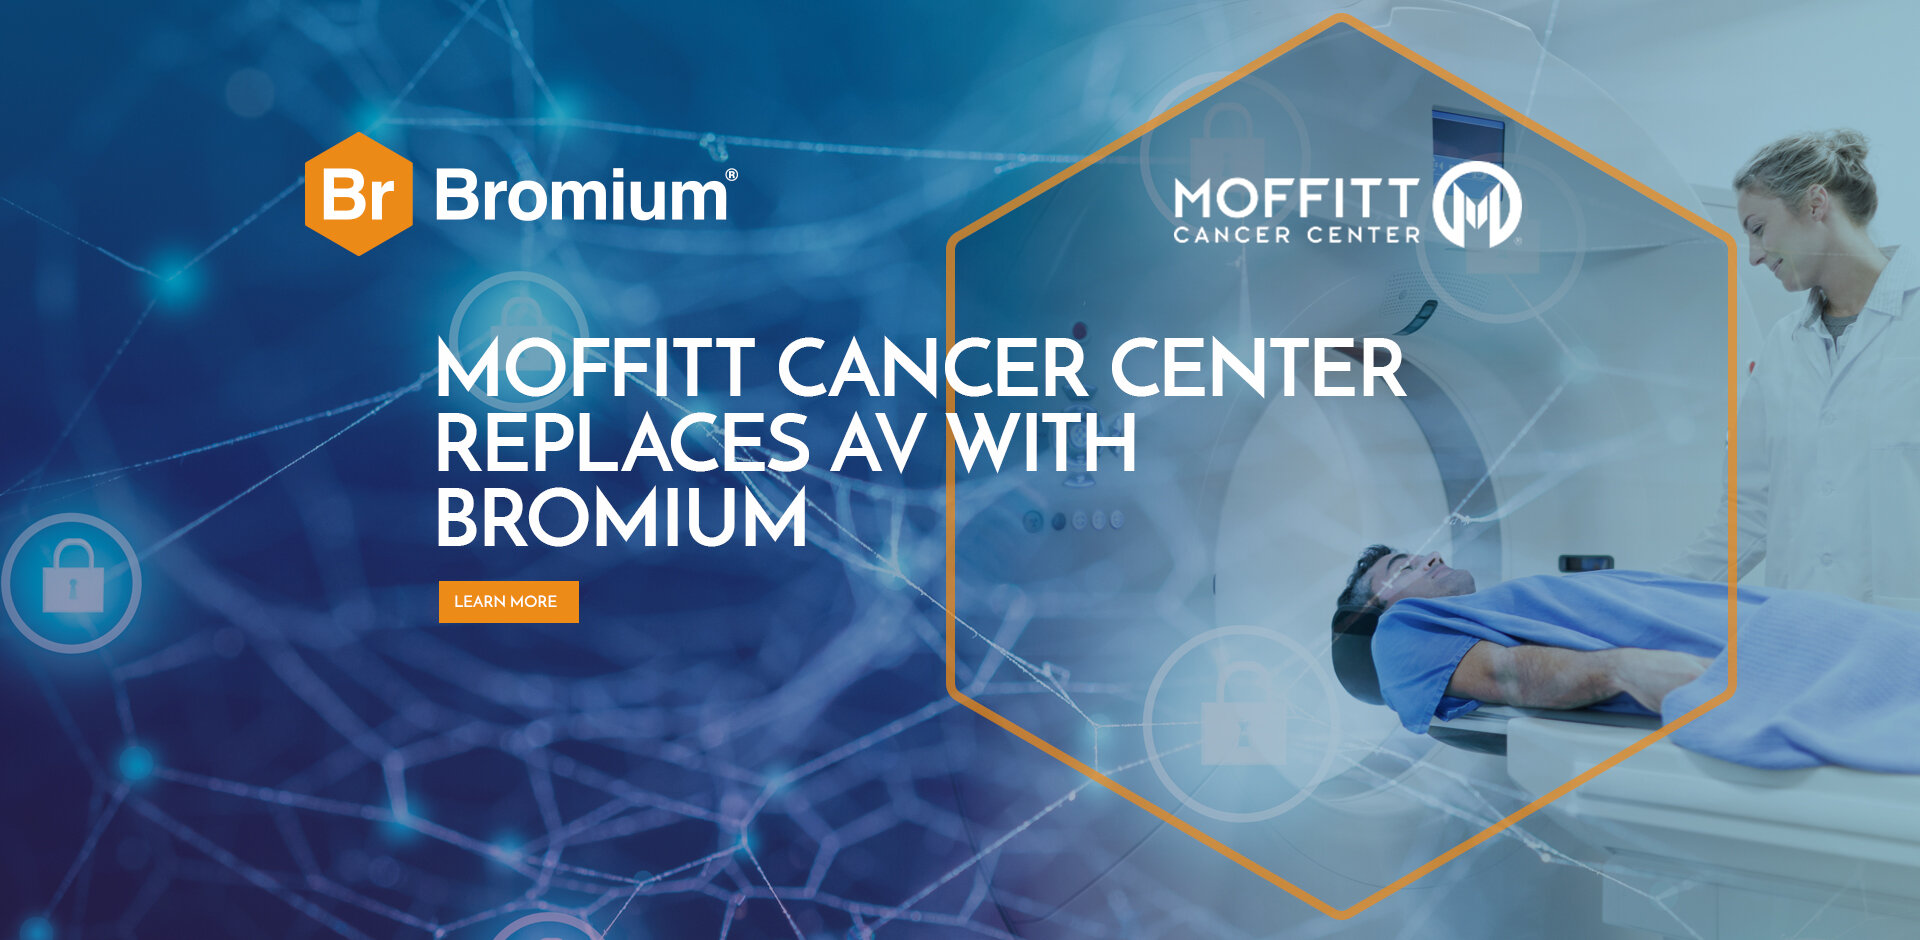 Bromium_Healthcare-Moffit_Homepage_Banner.jpg